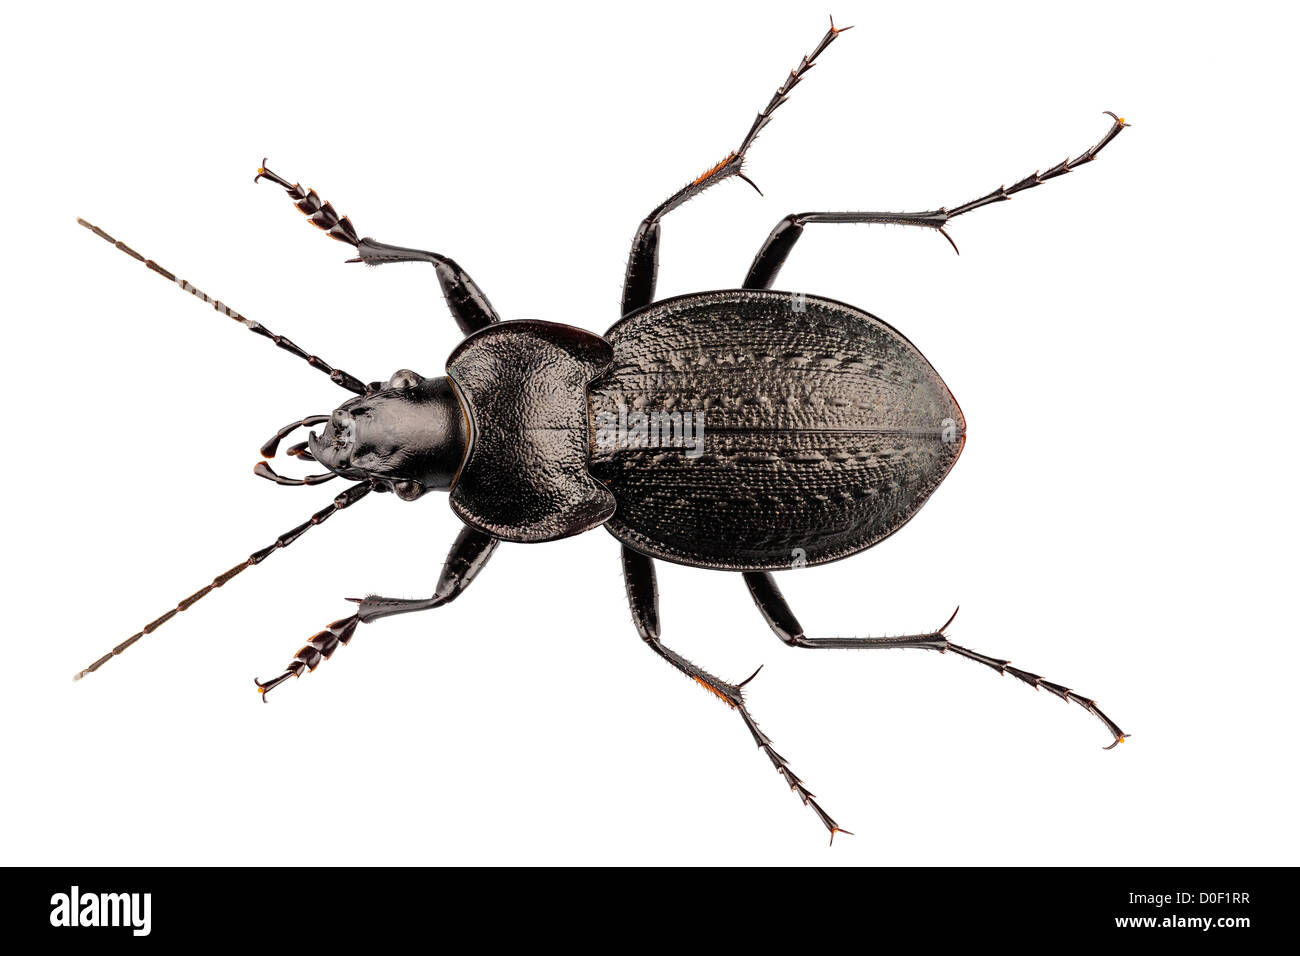 Käfer Arten Carabus Coriaceus Stockfoto Bild 51961835 Alamy